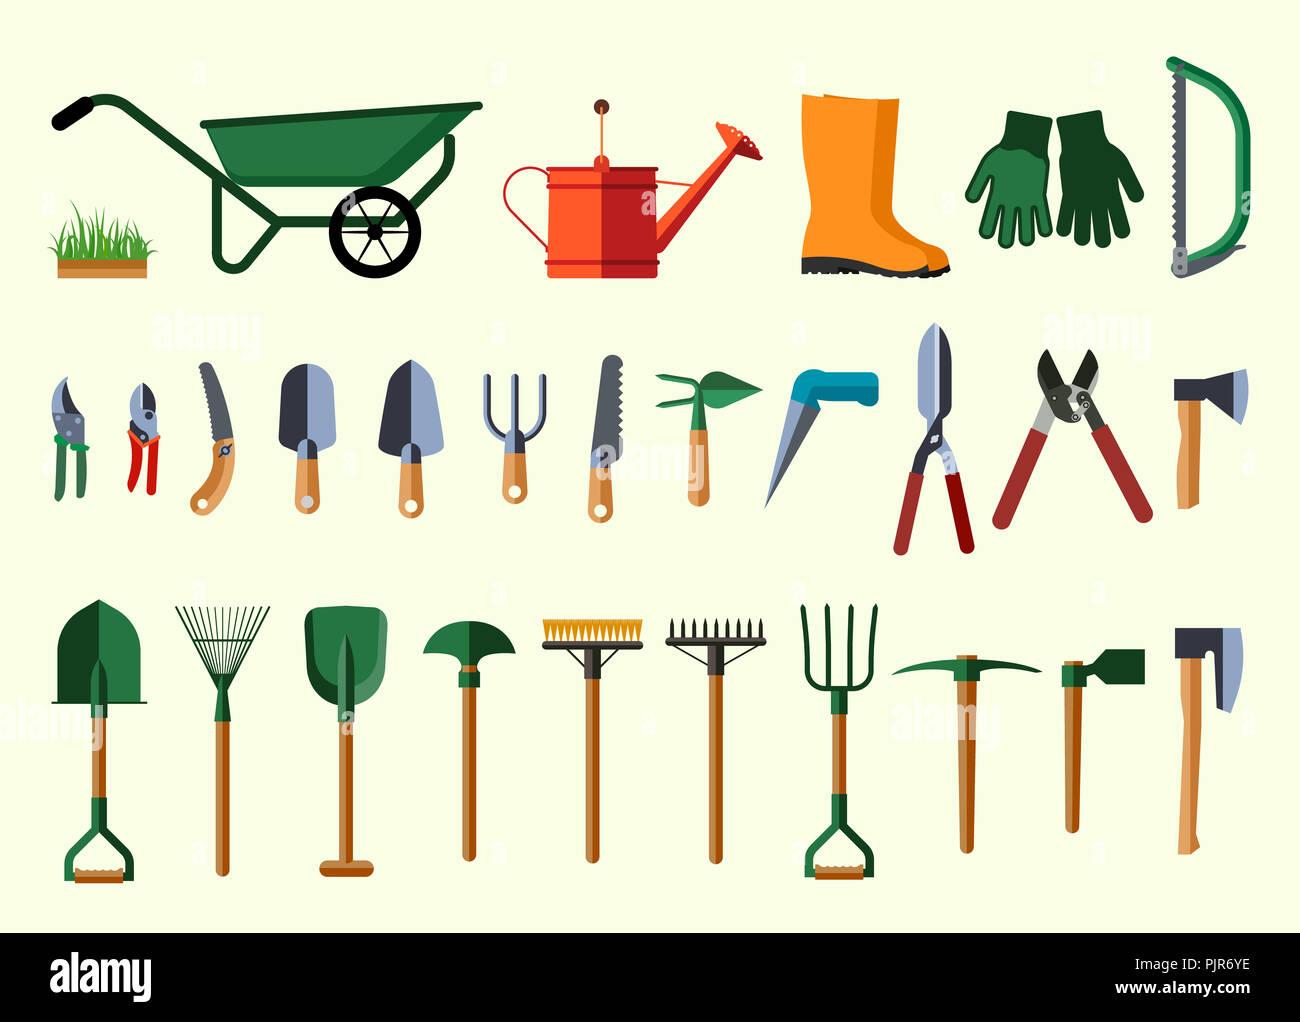 Garden Tools Flat Design Illustration Of Items For